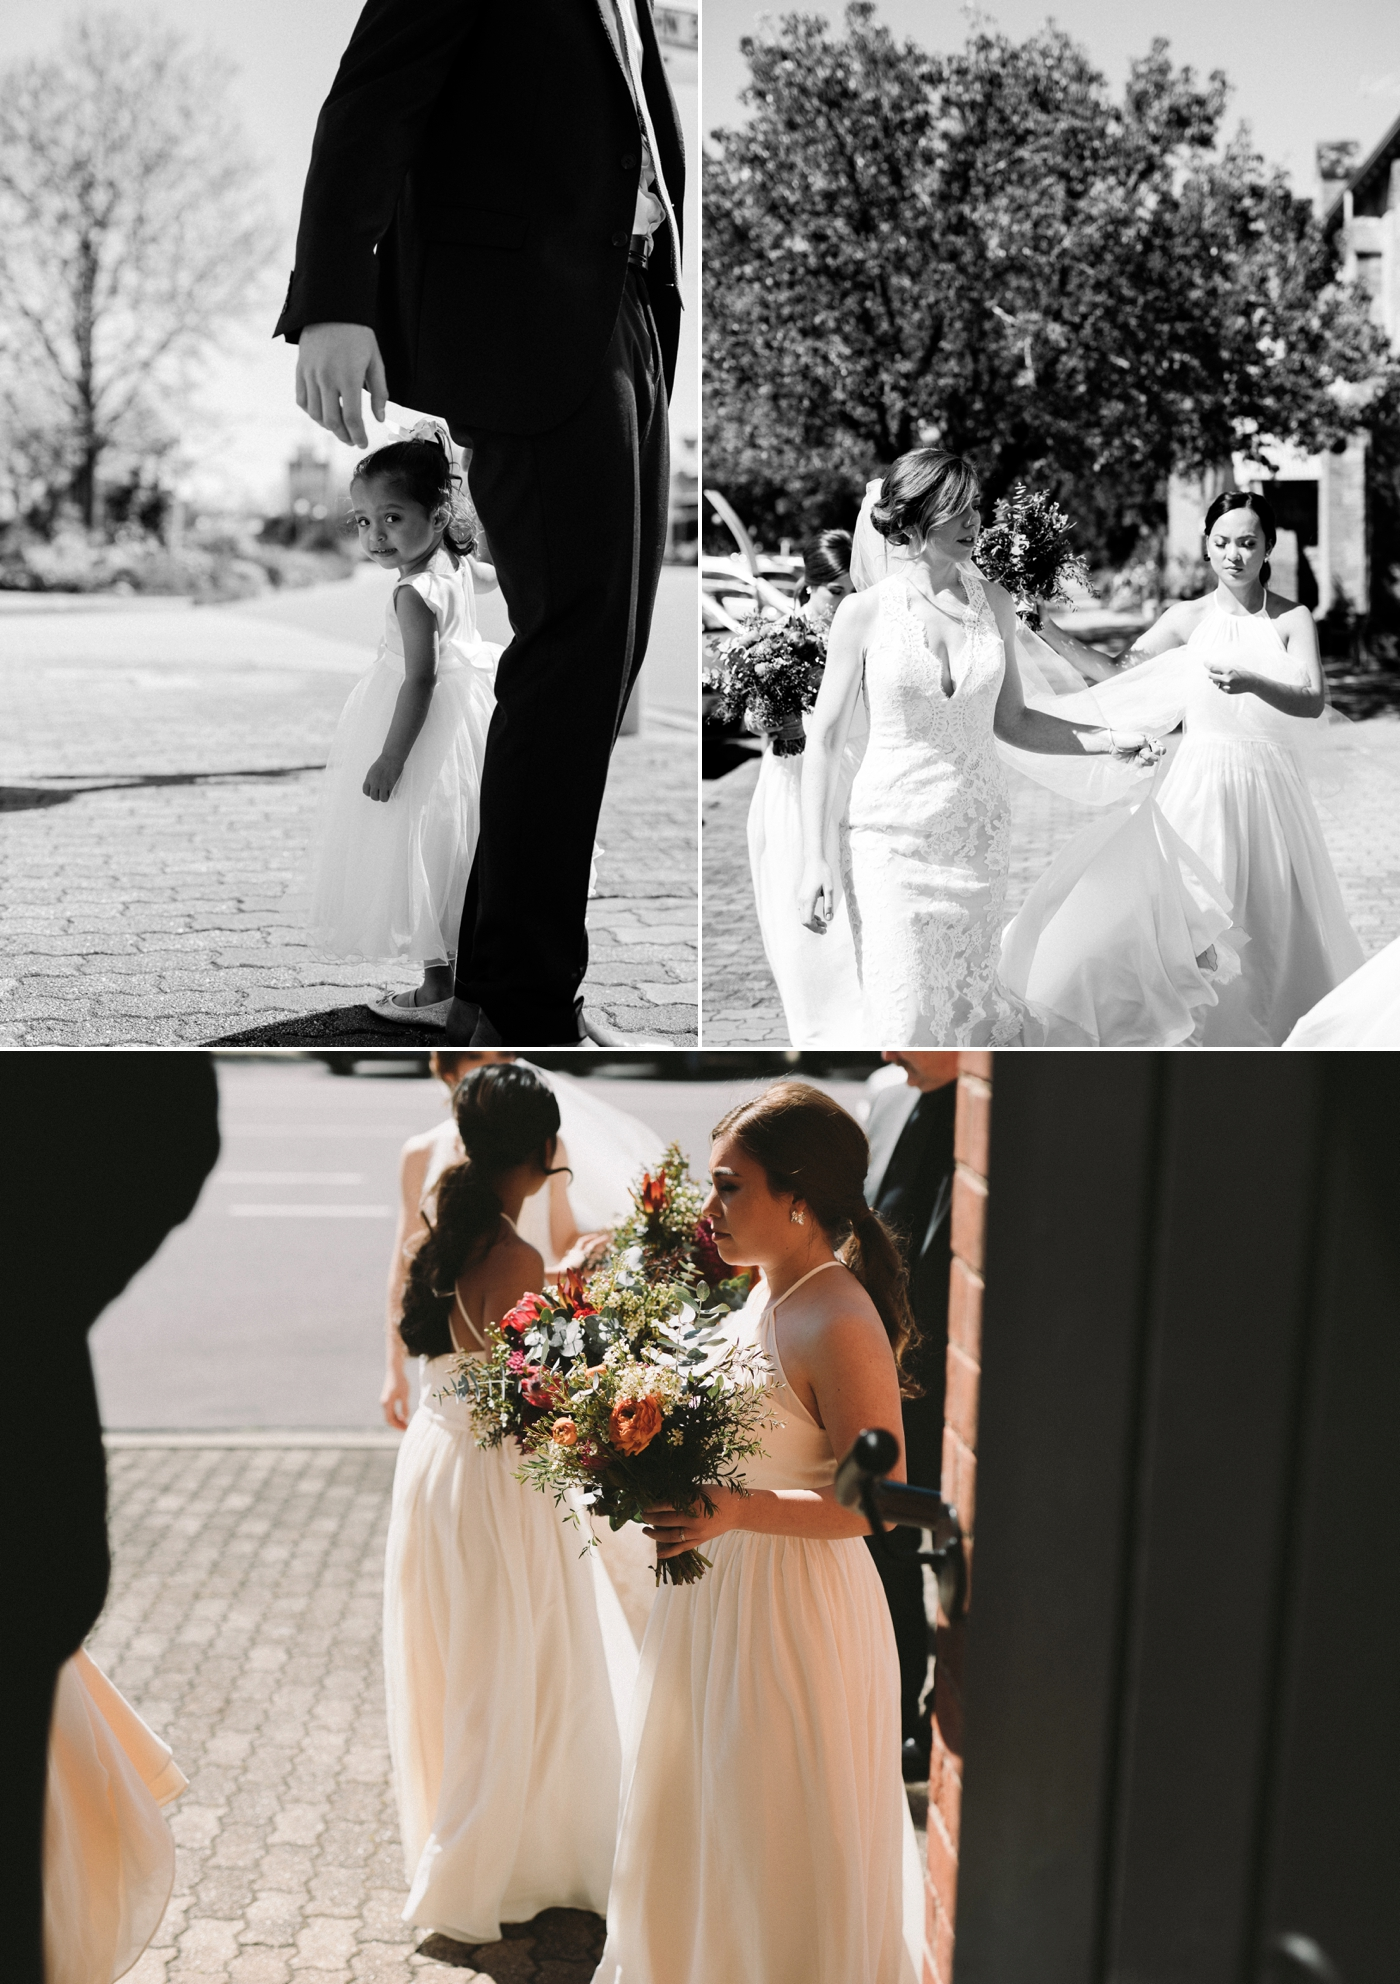 Erin & Ryan - Natural Wedding Photographer in Adelaide - Maximillians Wedding - Simple and Modern Wedding Photographer - Katherine Schultz - www.katherineschultzphotography.com_0009.jpg